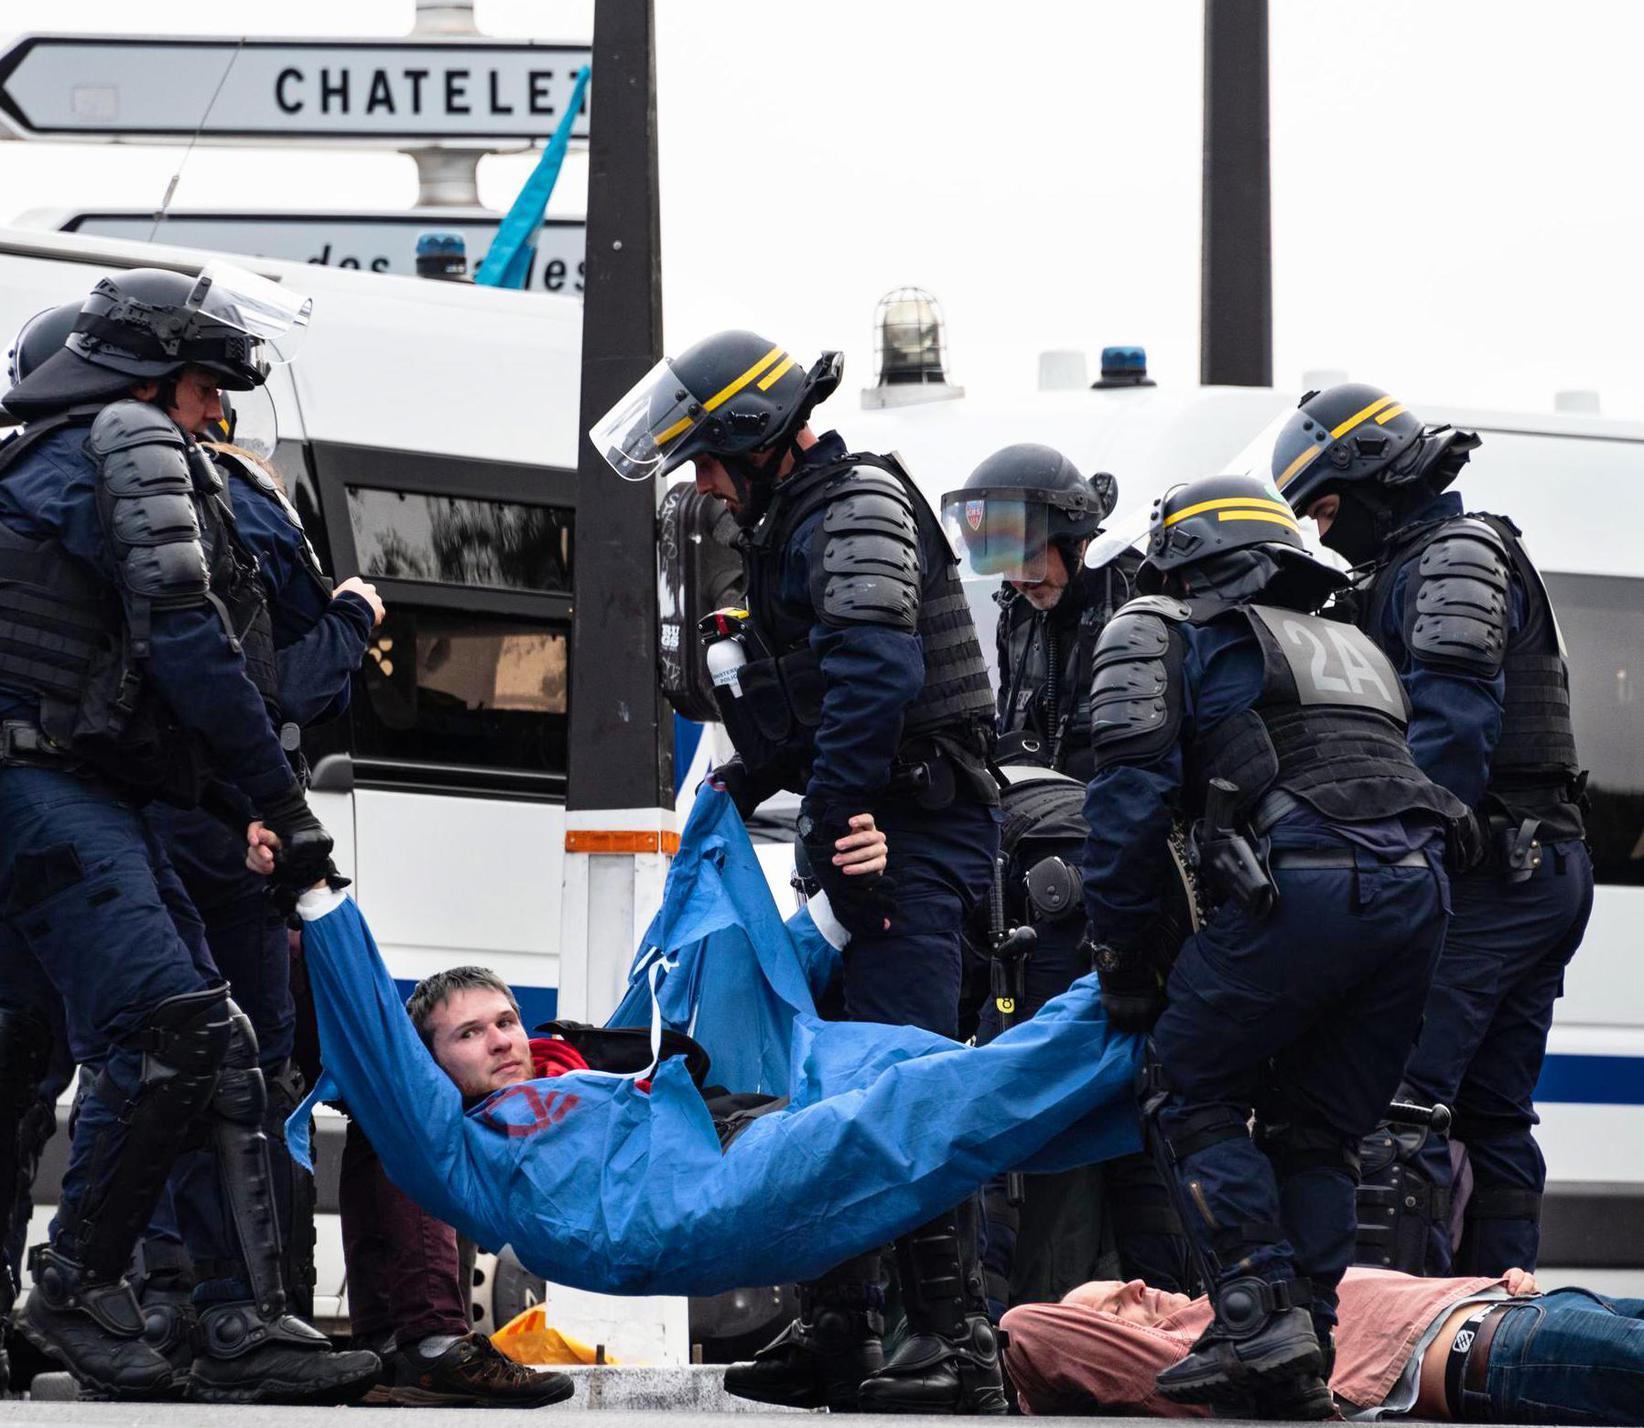 Nelly Terrier,Guillaume Georges (photos,Sauf Mention)à Nantes